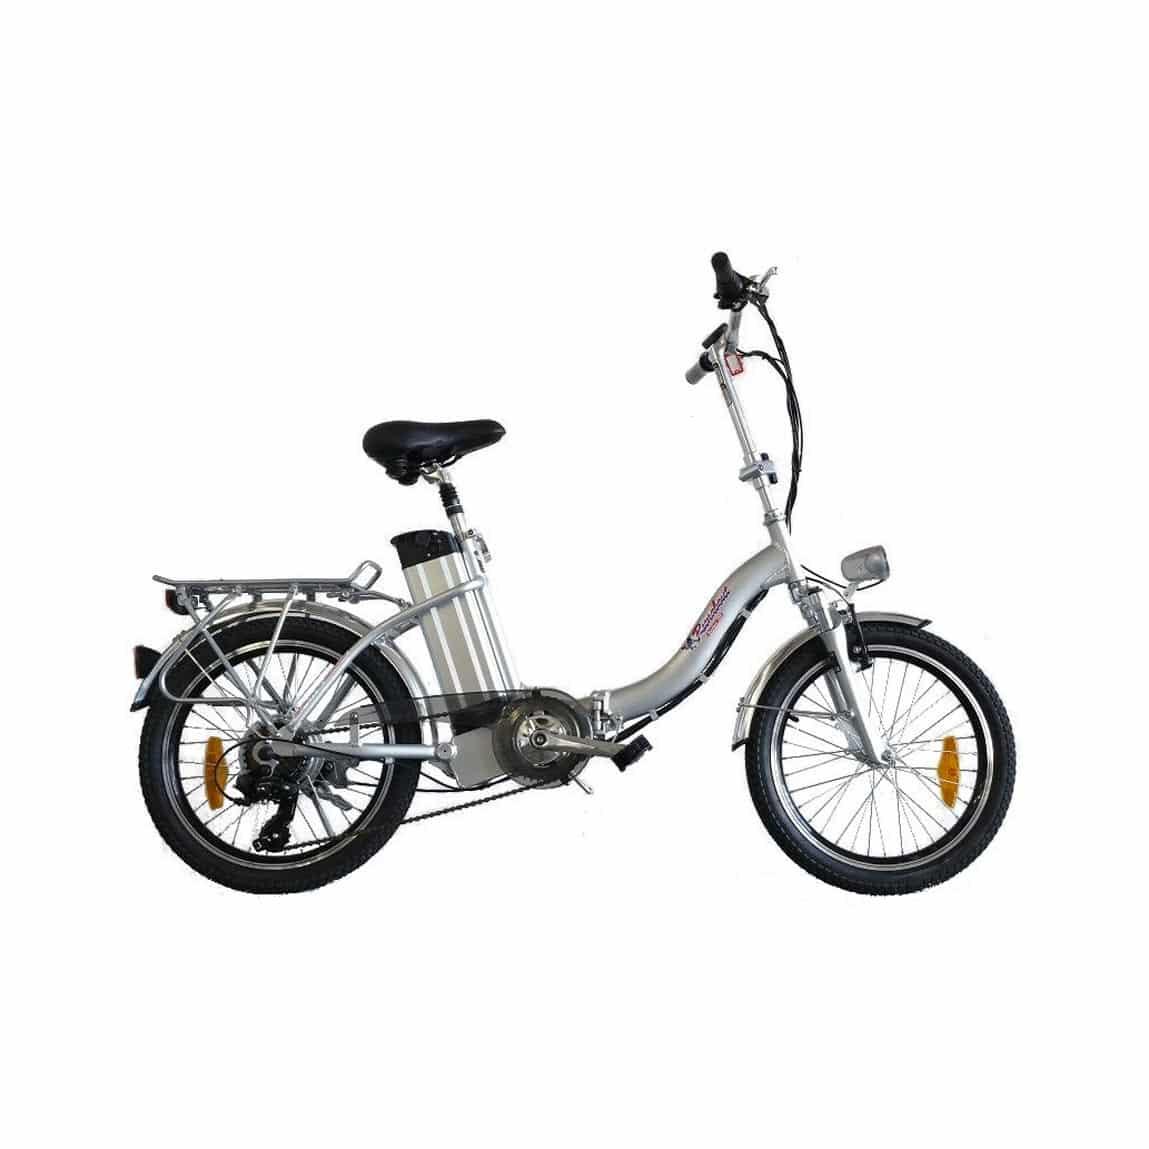 Ctma Runabout Electric Bike